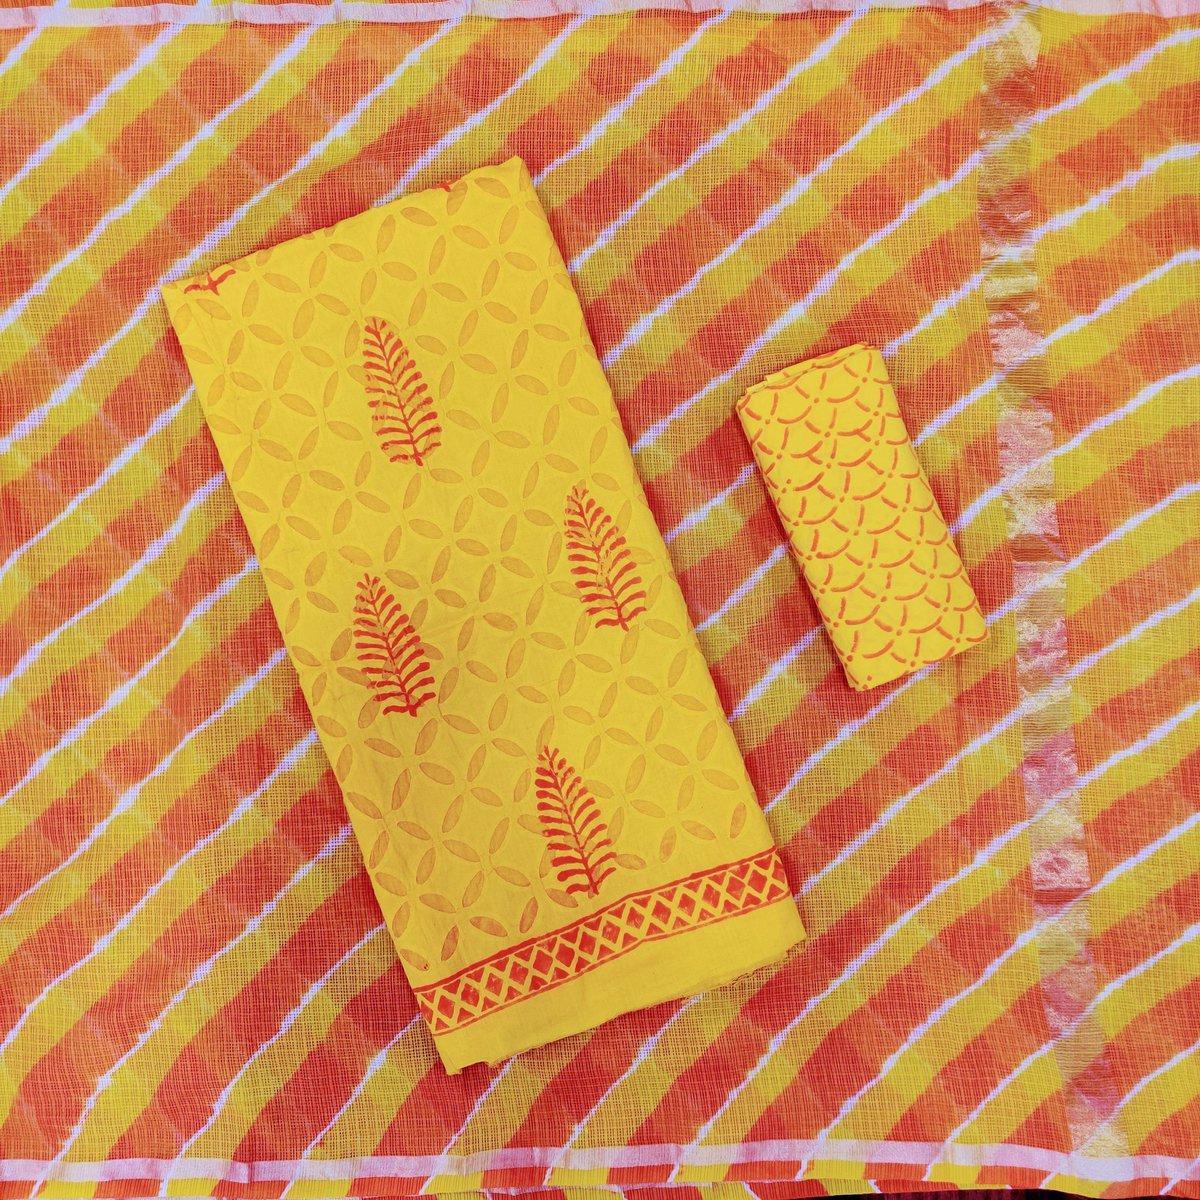 Dress Material consisting of Cotton Applique Printed Top, Kota Doria Leheriya Dupatta & Cotton Printed Bottom  #fashion #clothing #apparel #cotton #applique #print #printed #kurta #kurti #kota #kotadoria #leheriya #dupatta #bottom #dressmaterial #unstitched #shopping #traditionalpic.twitter.com/7gSlSXanTl